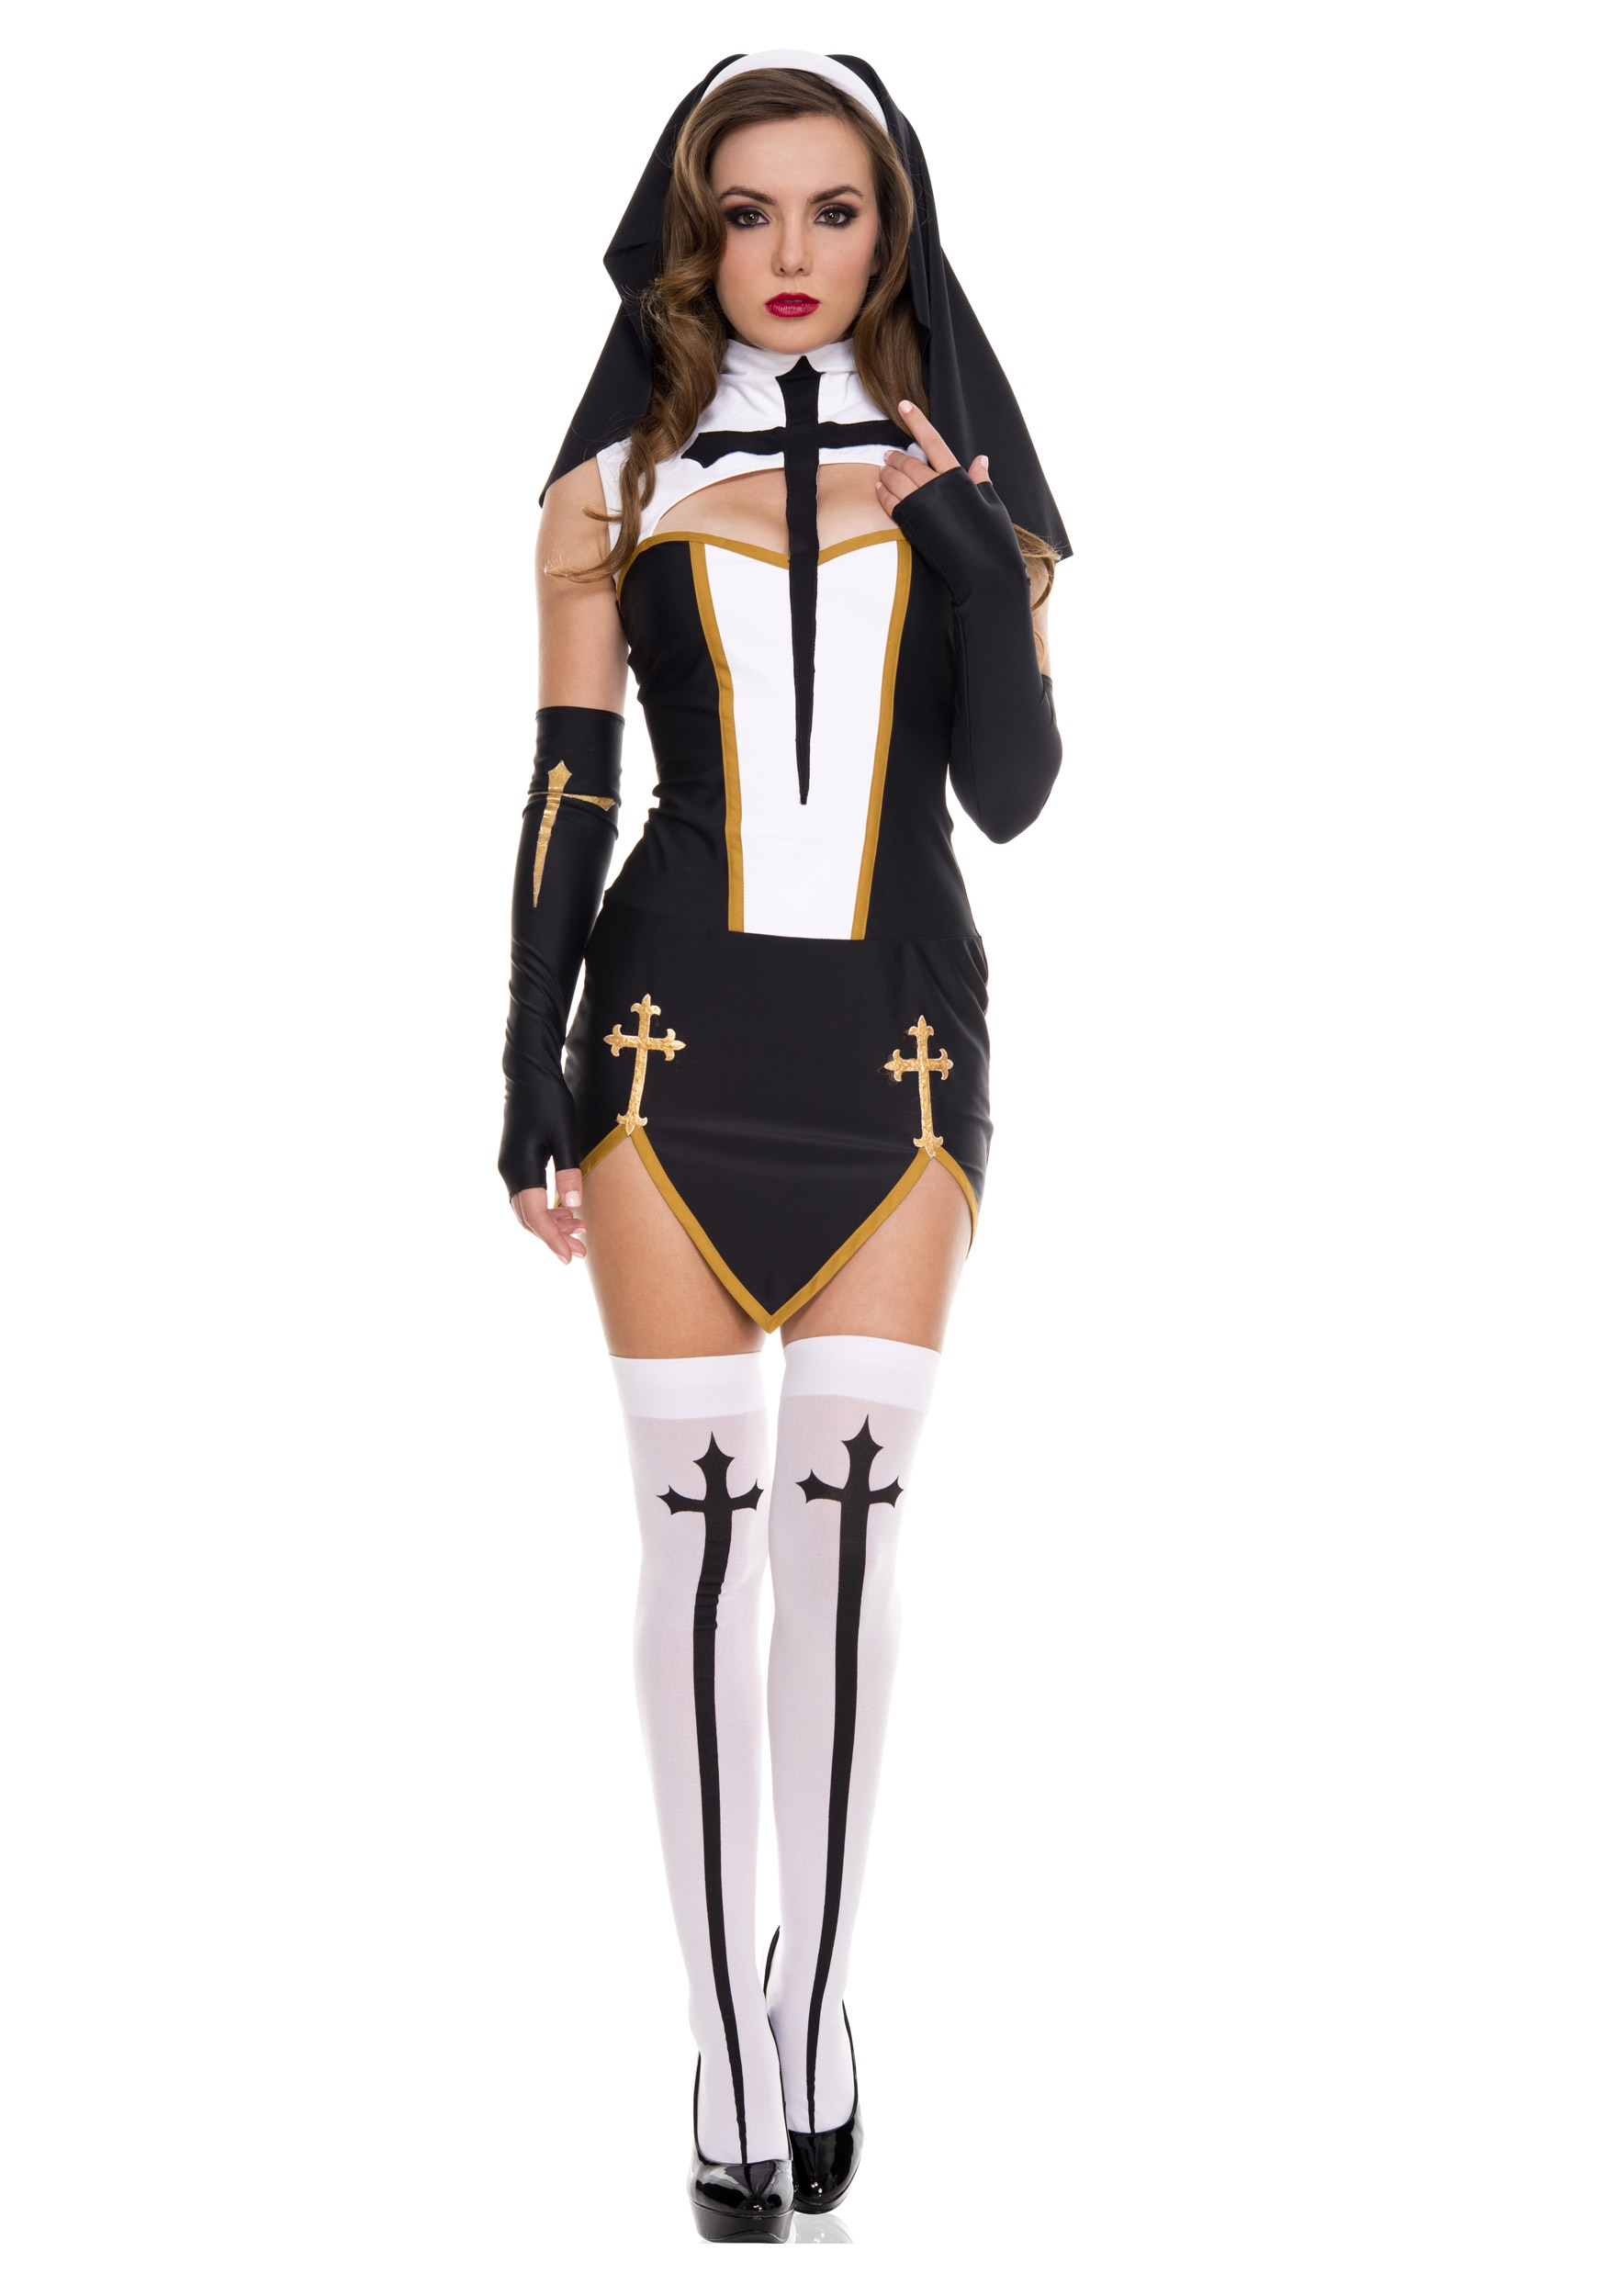 Bad Habit Nun Costume W/ Dress & Thigh High Stockings